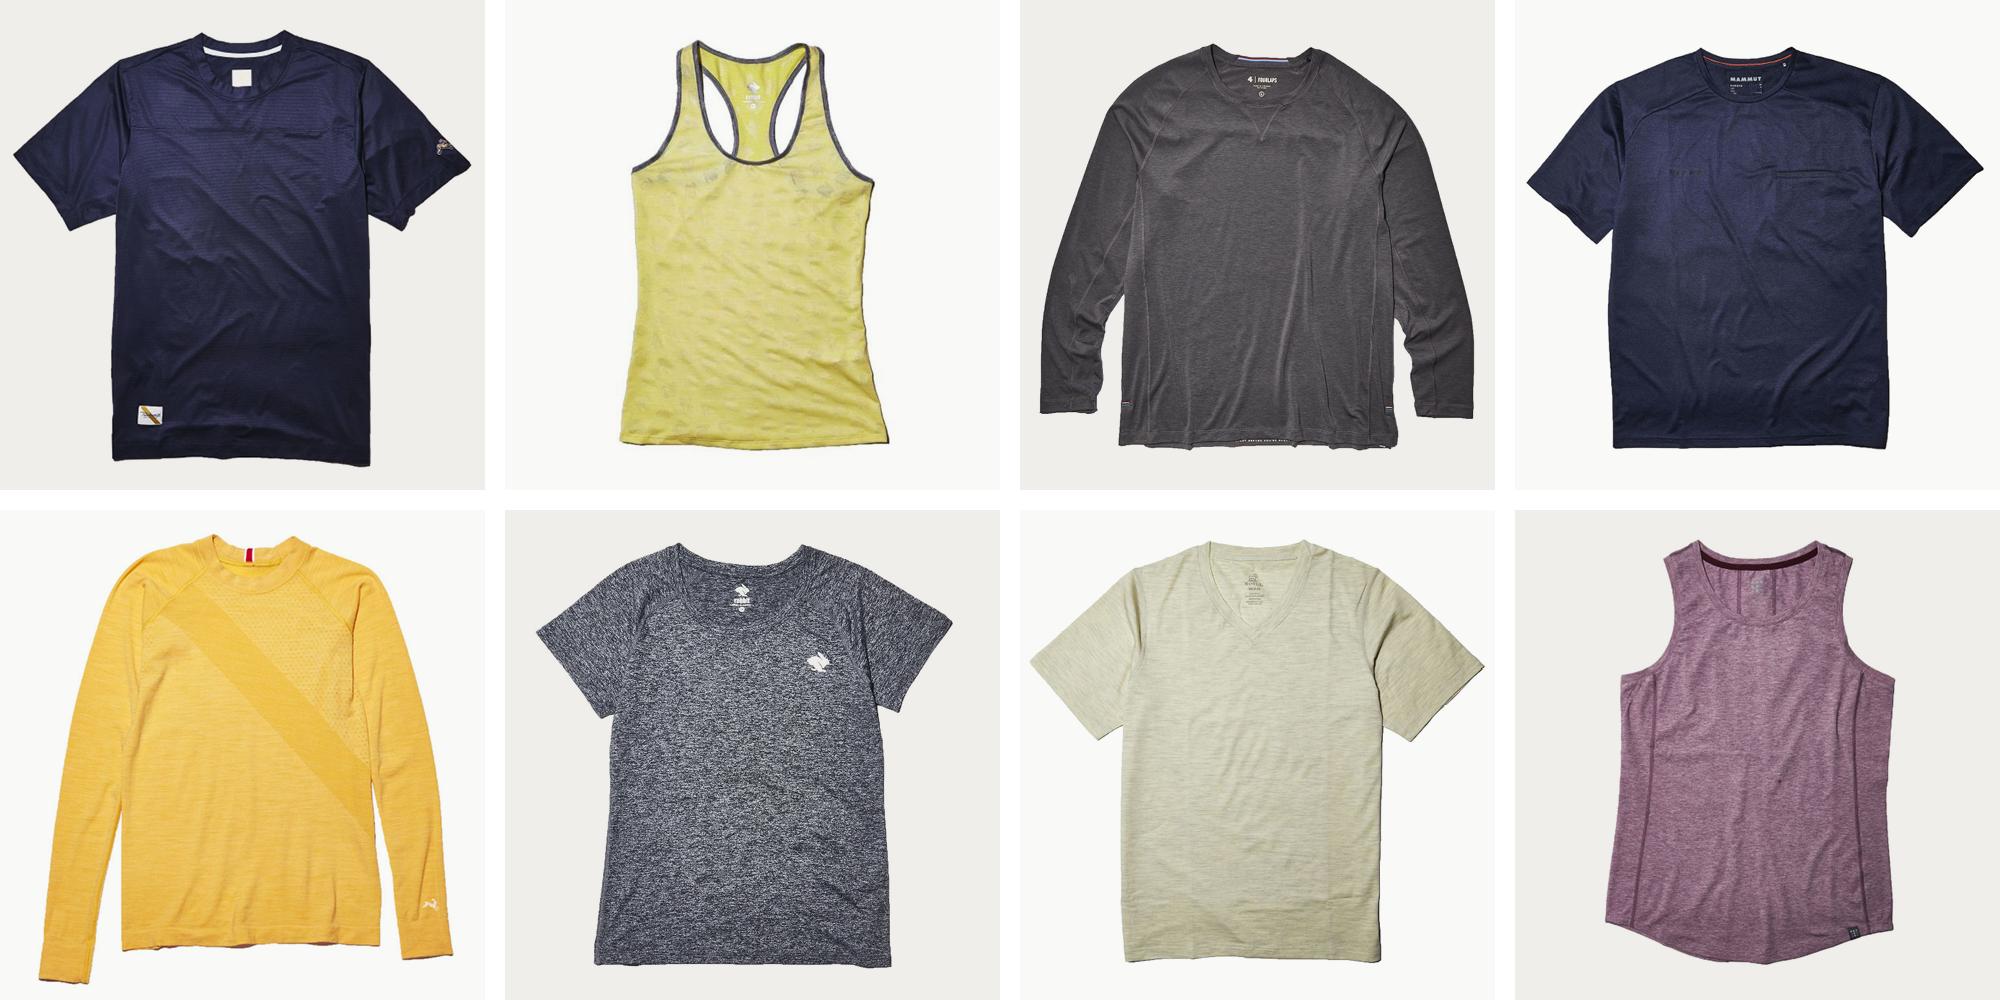 Cardigo Mens Solid Color Sport Slim Fit Vest Sleeveless Top Short Shirt Blouse